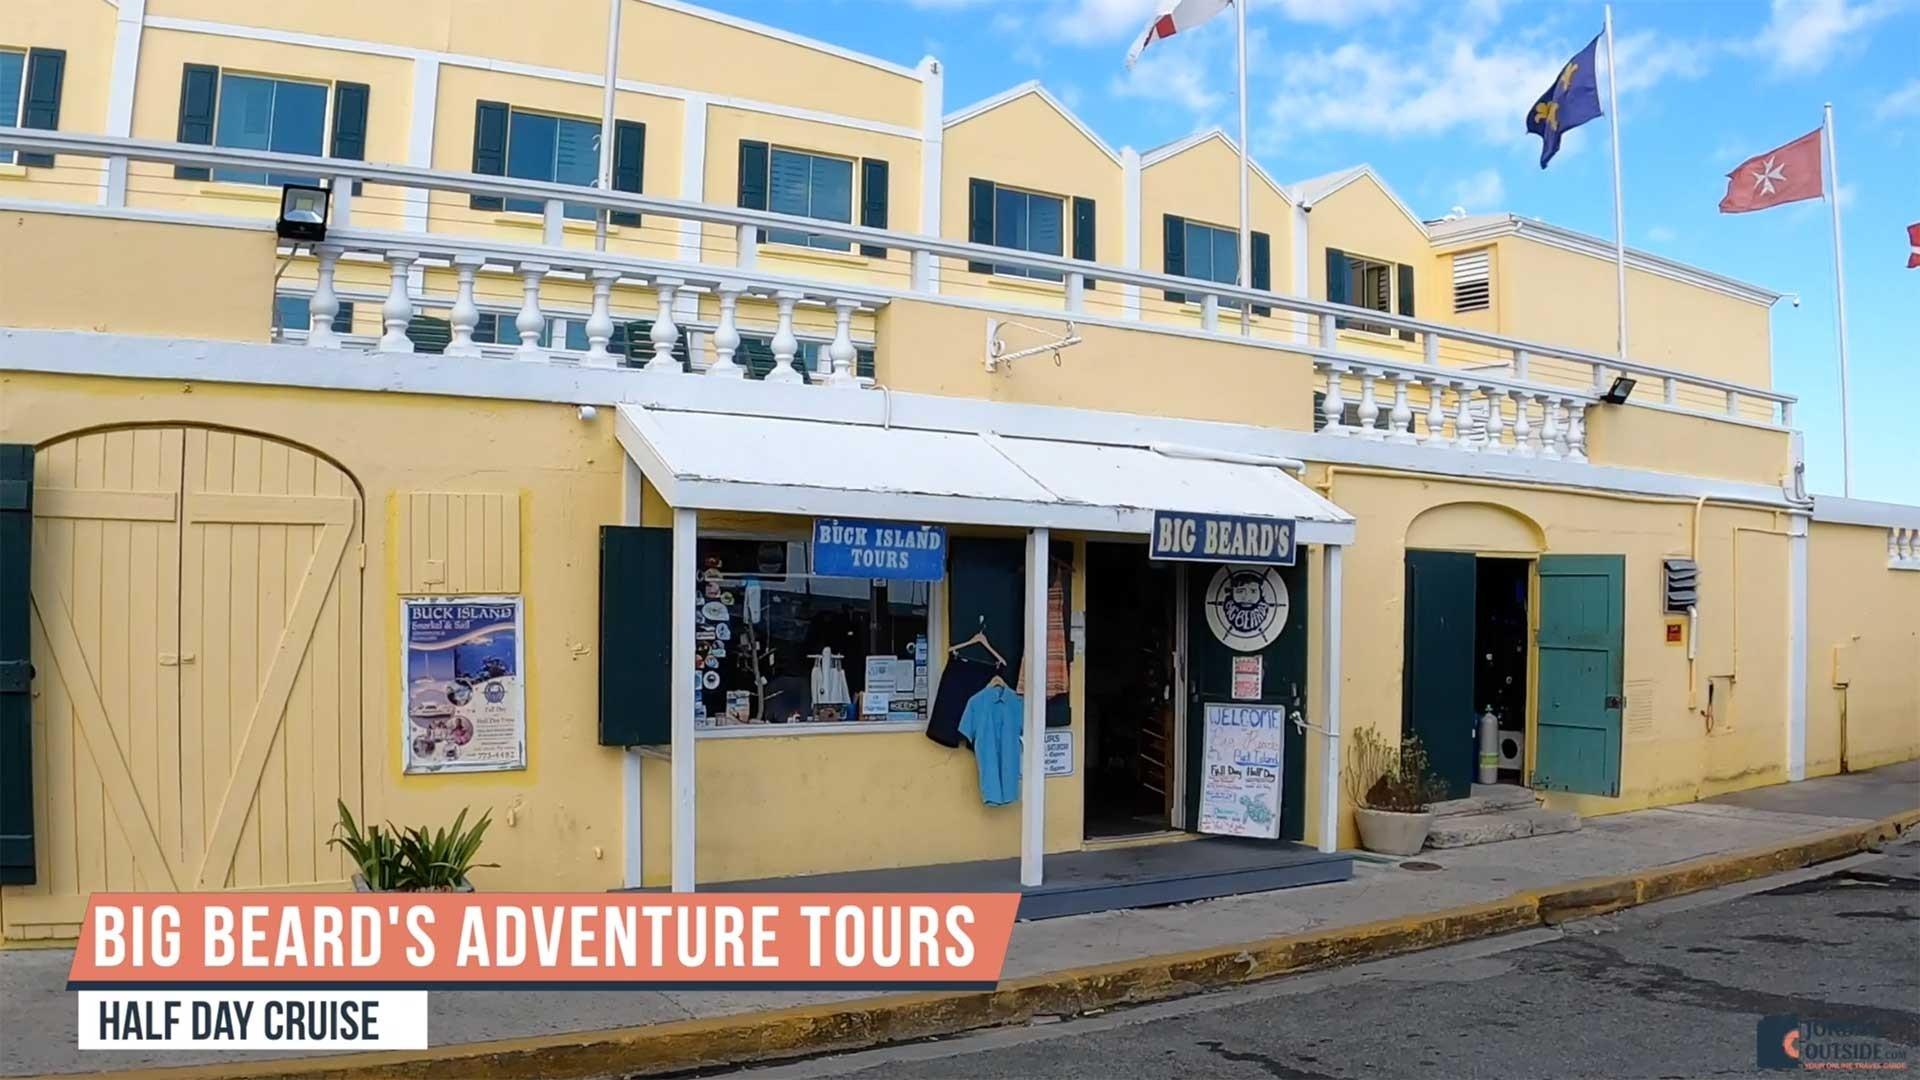 Big Beard's Adventure Tours, St. Croix